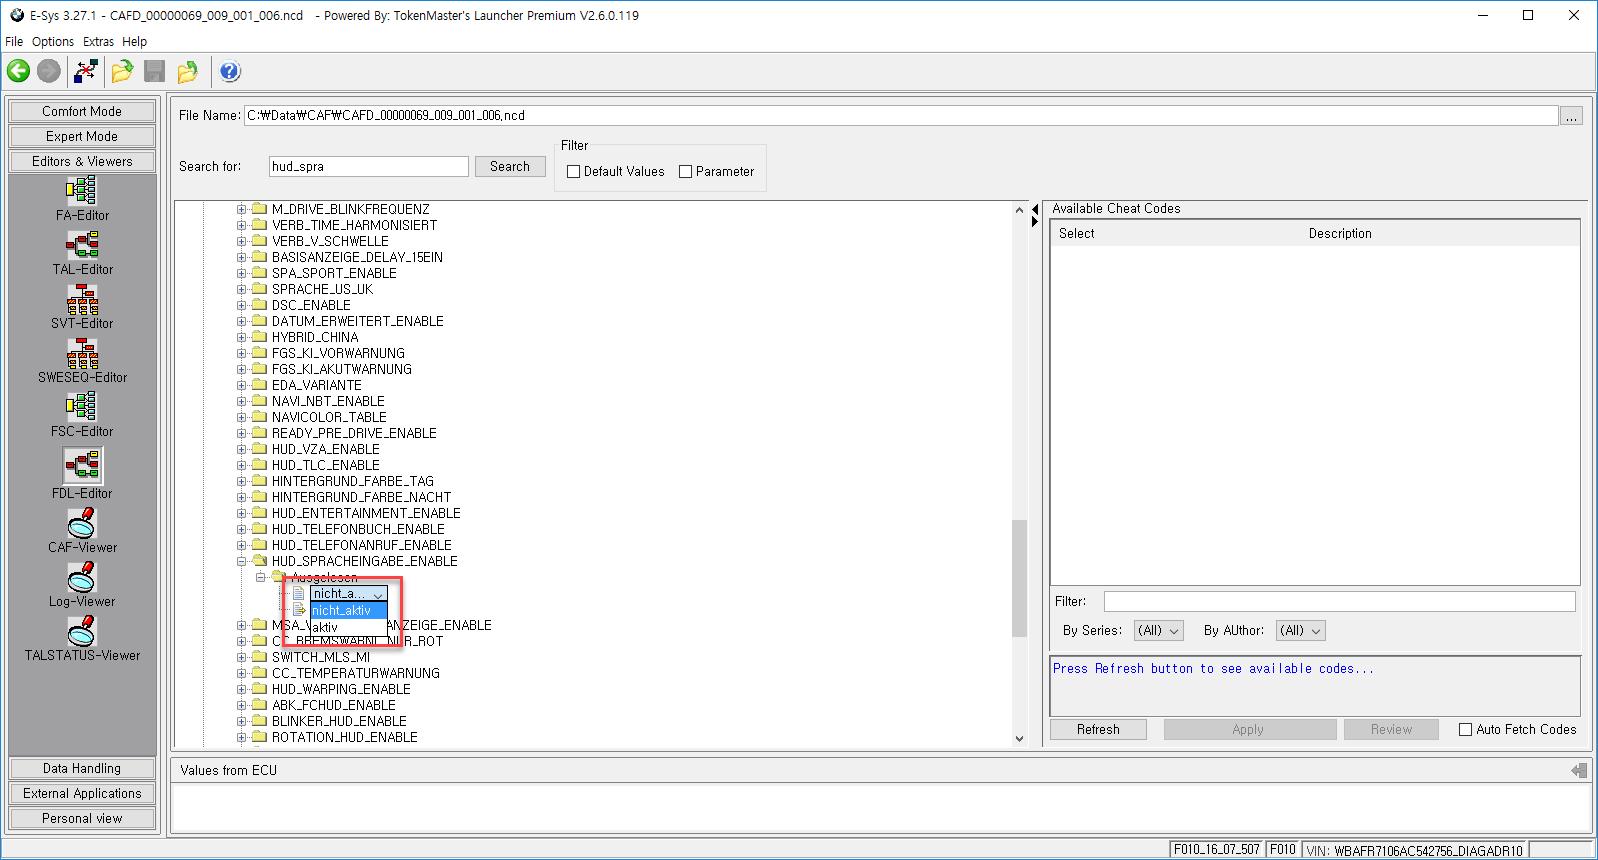 bmw-f15-x5-fdl-coding-by-bmw-esys-bmw-enet-cable-8